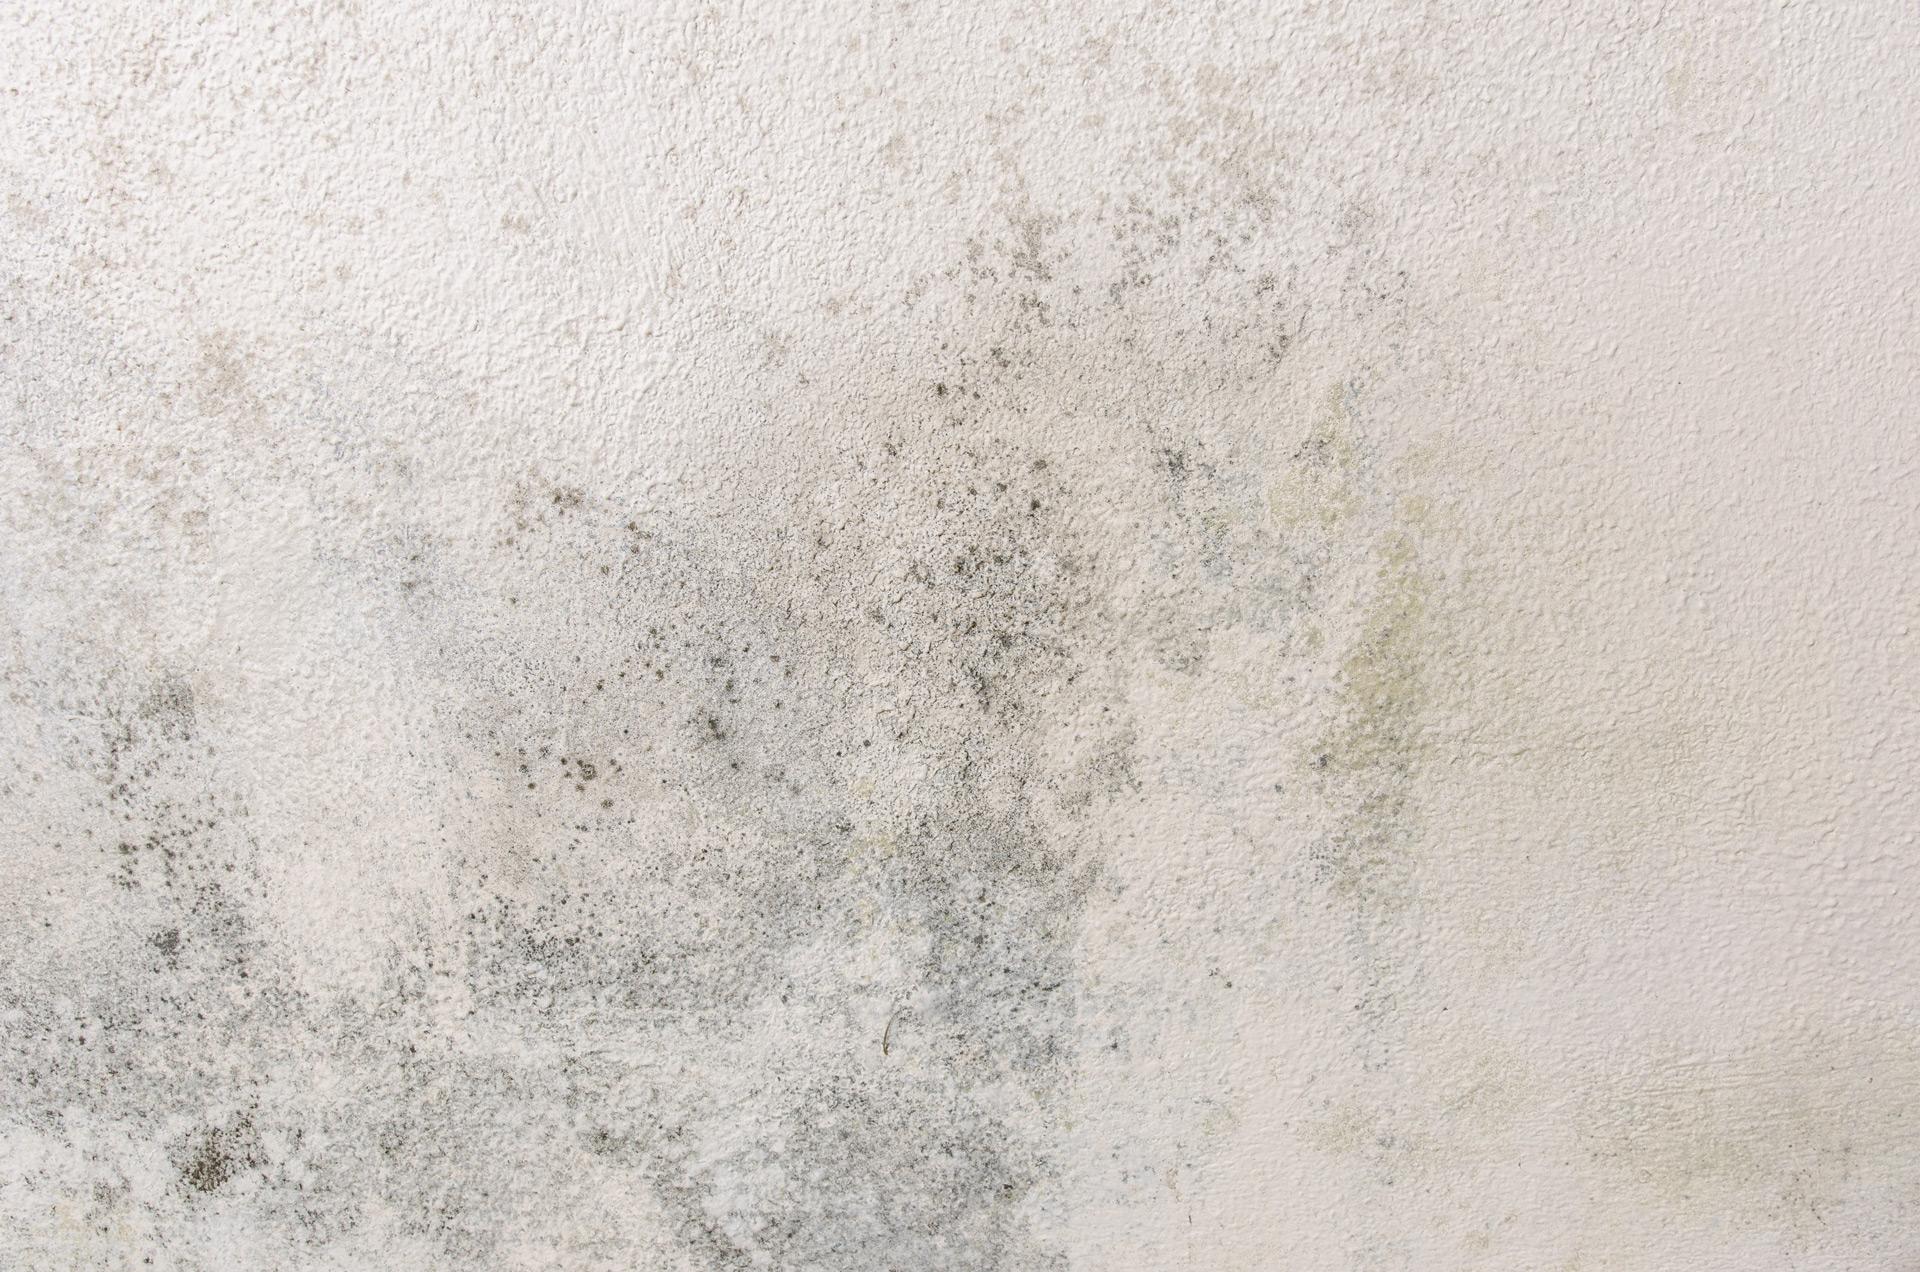 humidite-mur-salle-bain